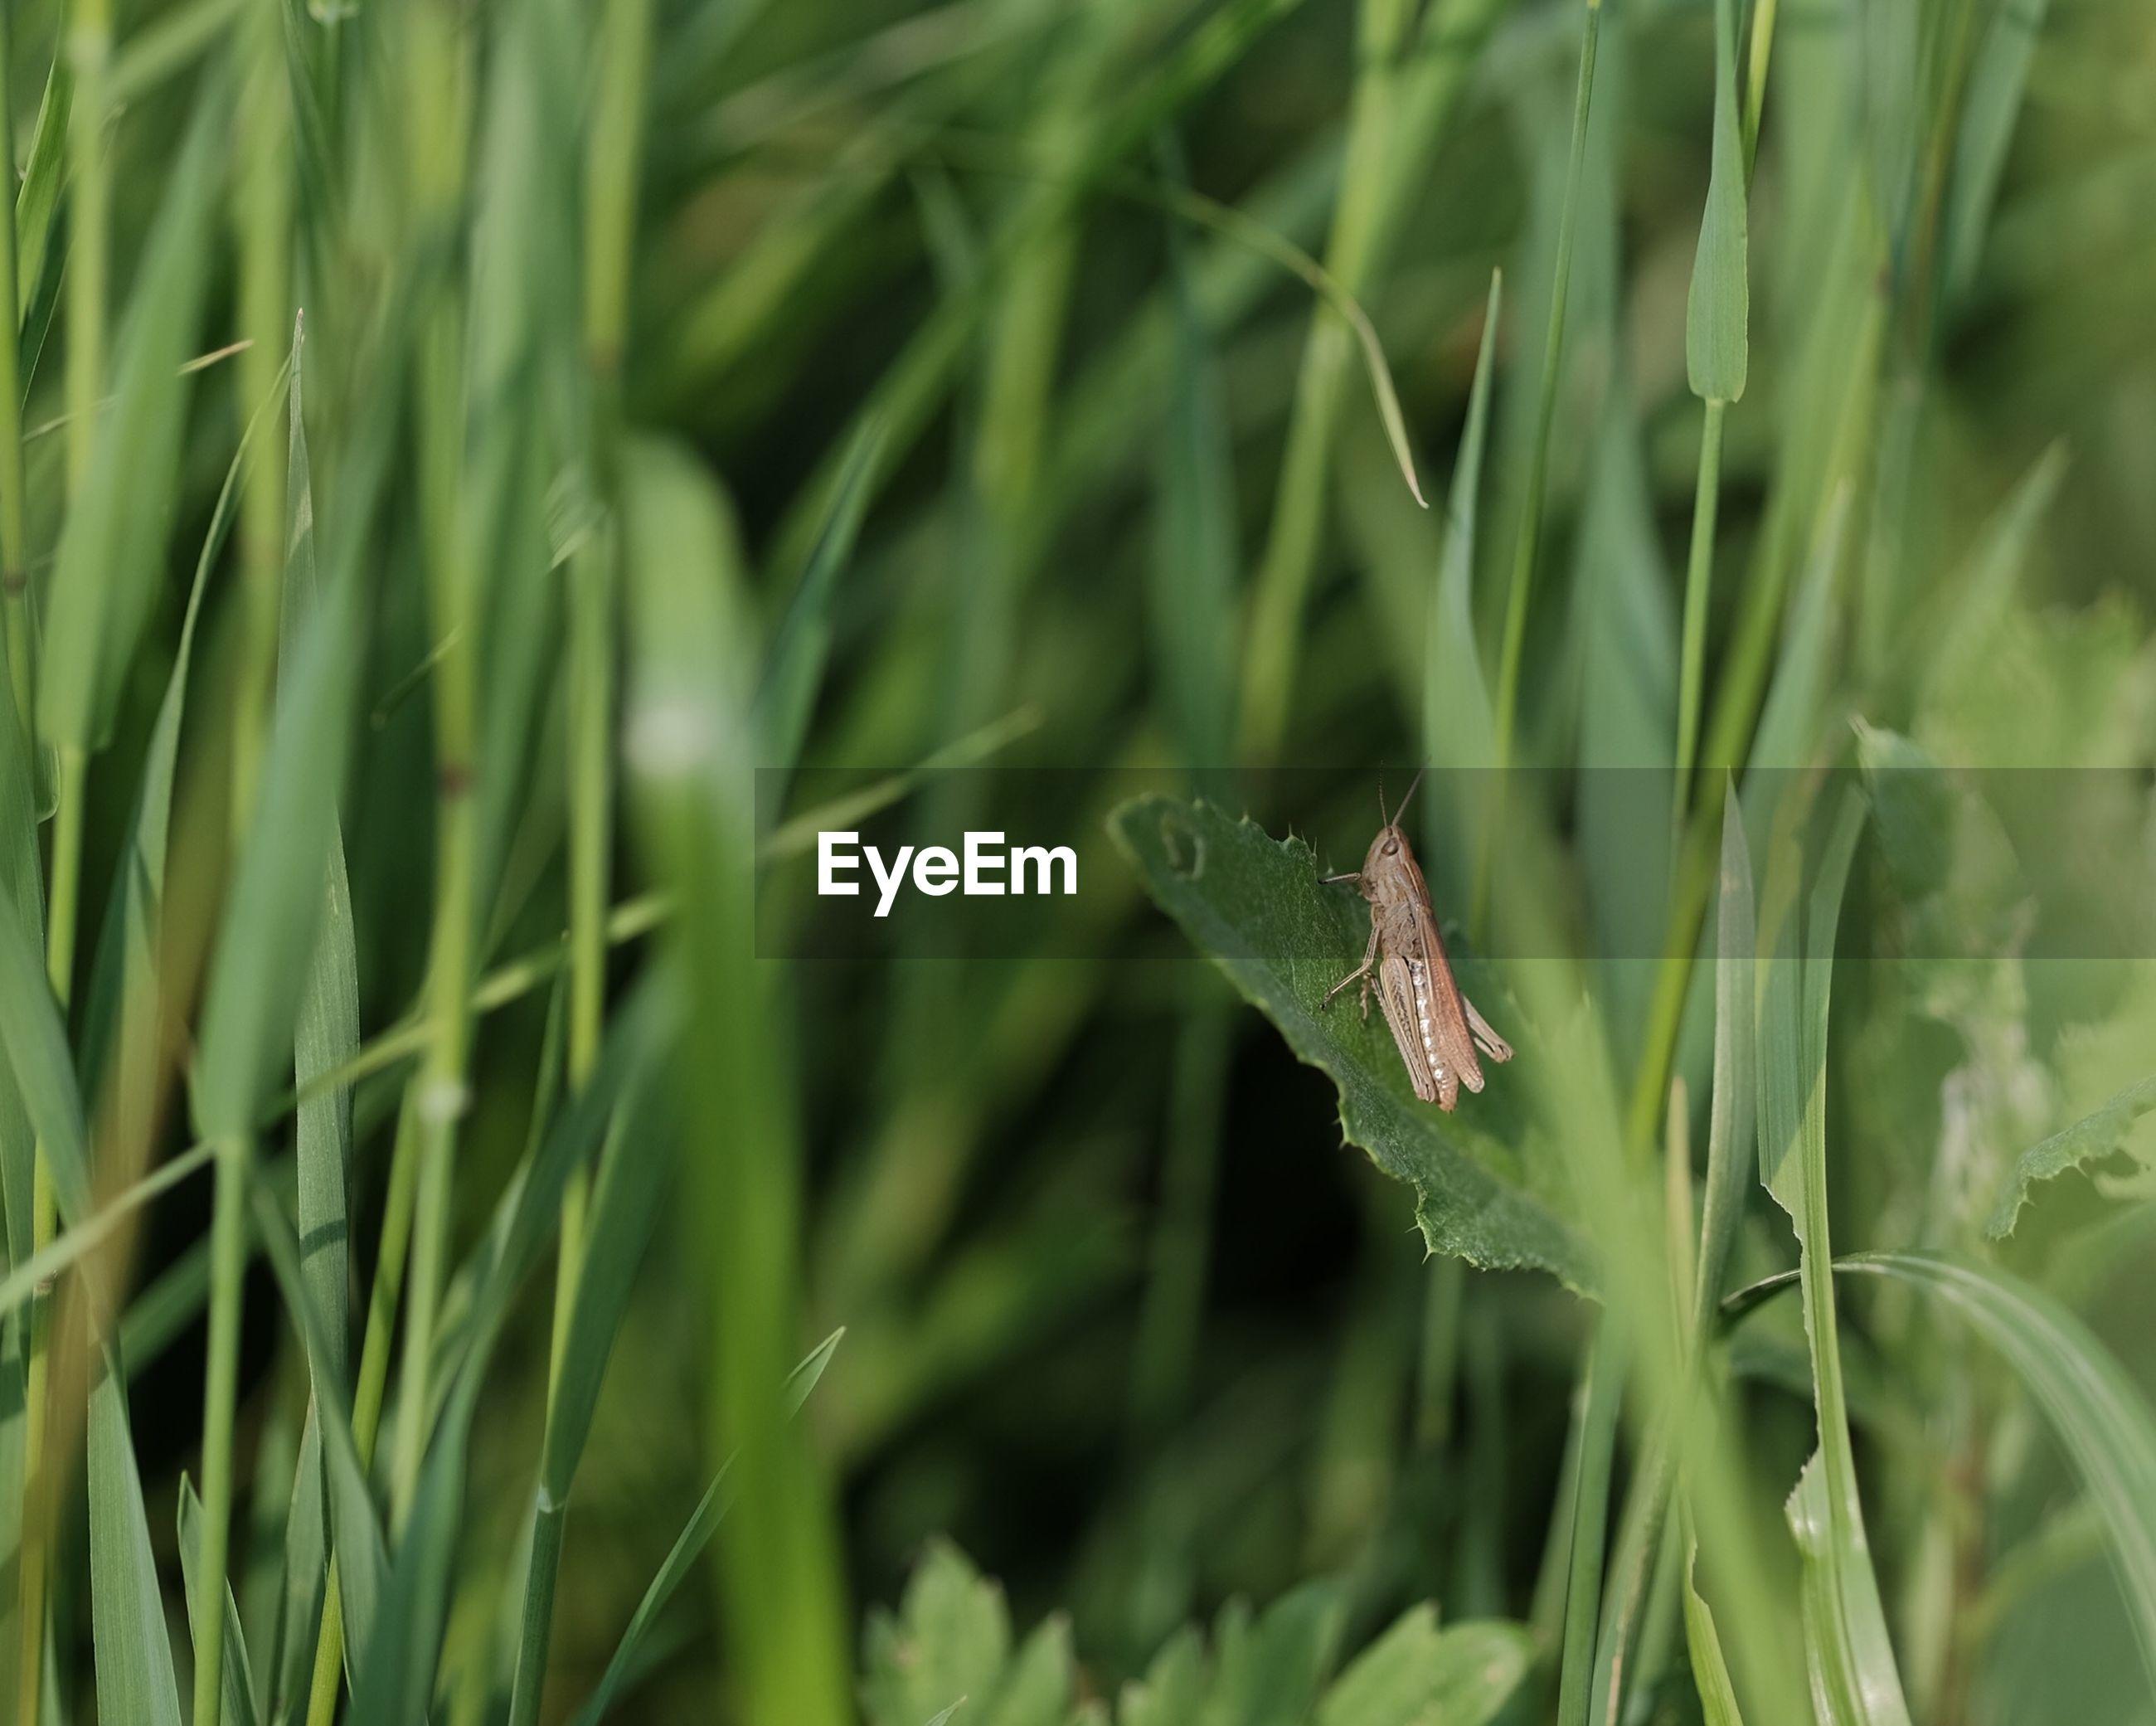 Grasshopper on leaf at field